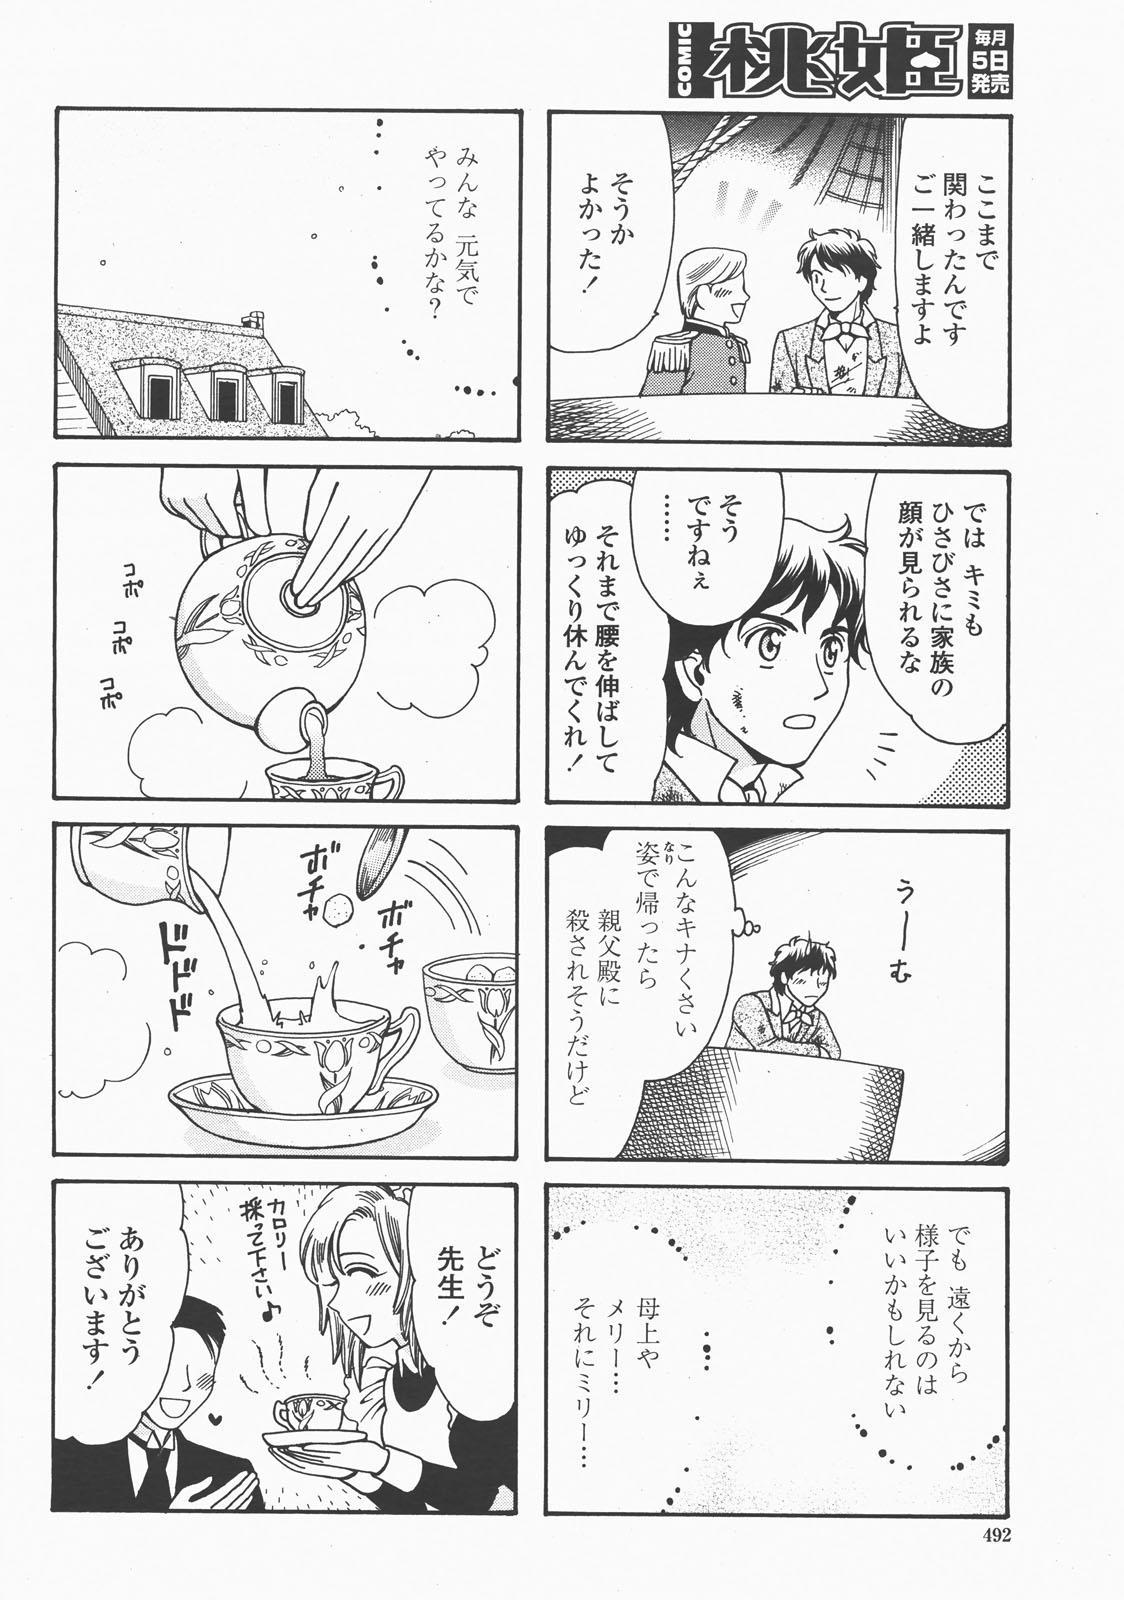 COMIC Momohime 2007-12 494